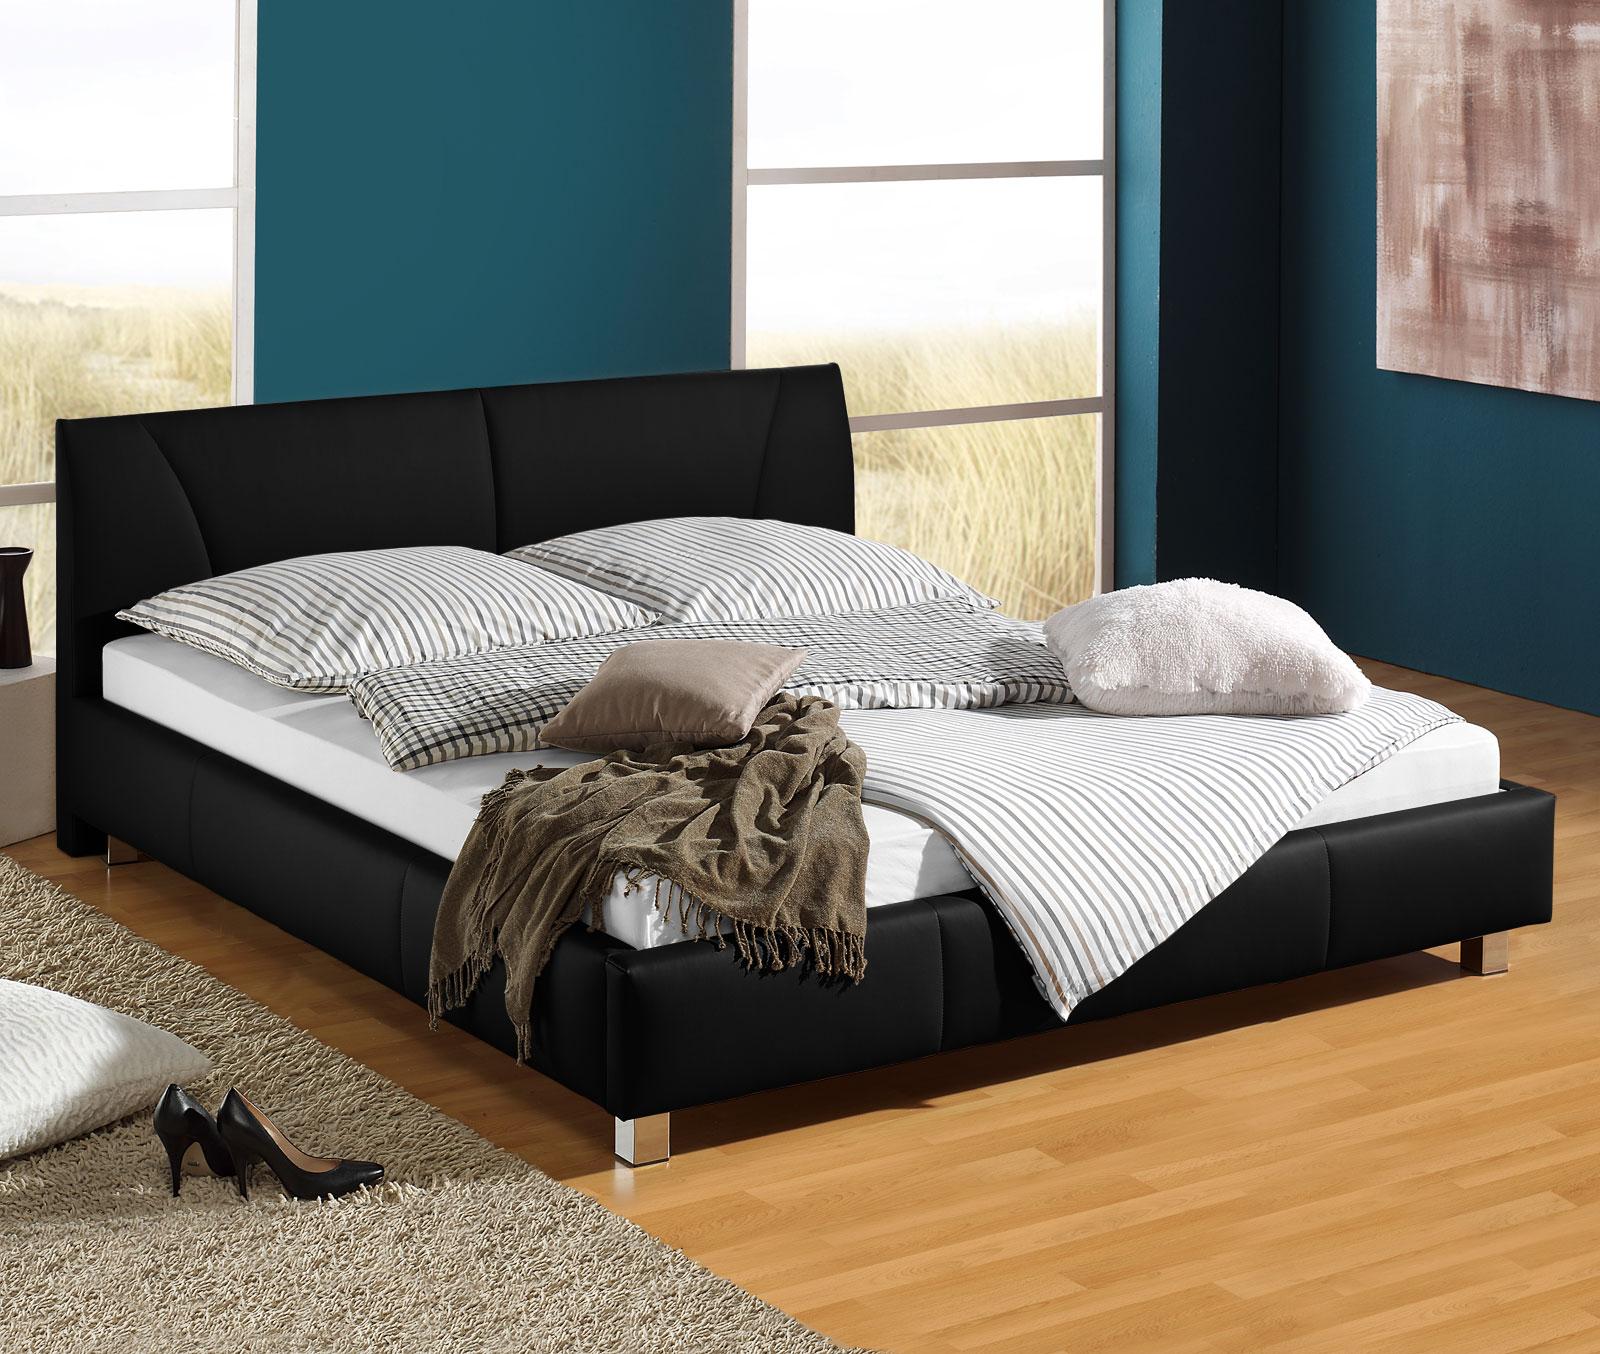 betten inkl lattenrost und matratze. Black Bedroom Furniture Sets. Home Design Ideas